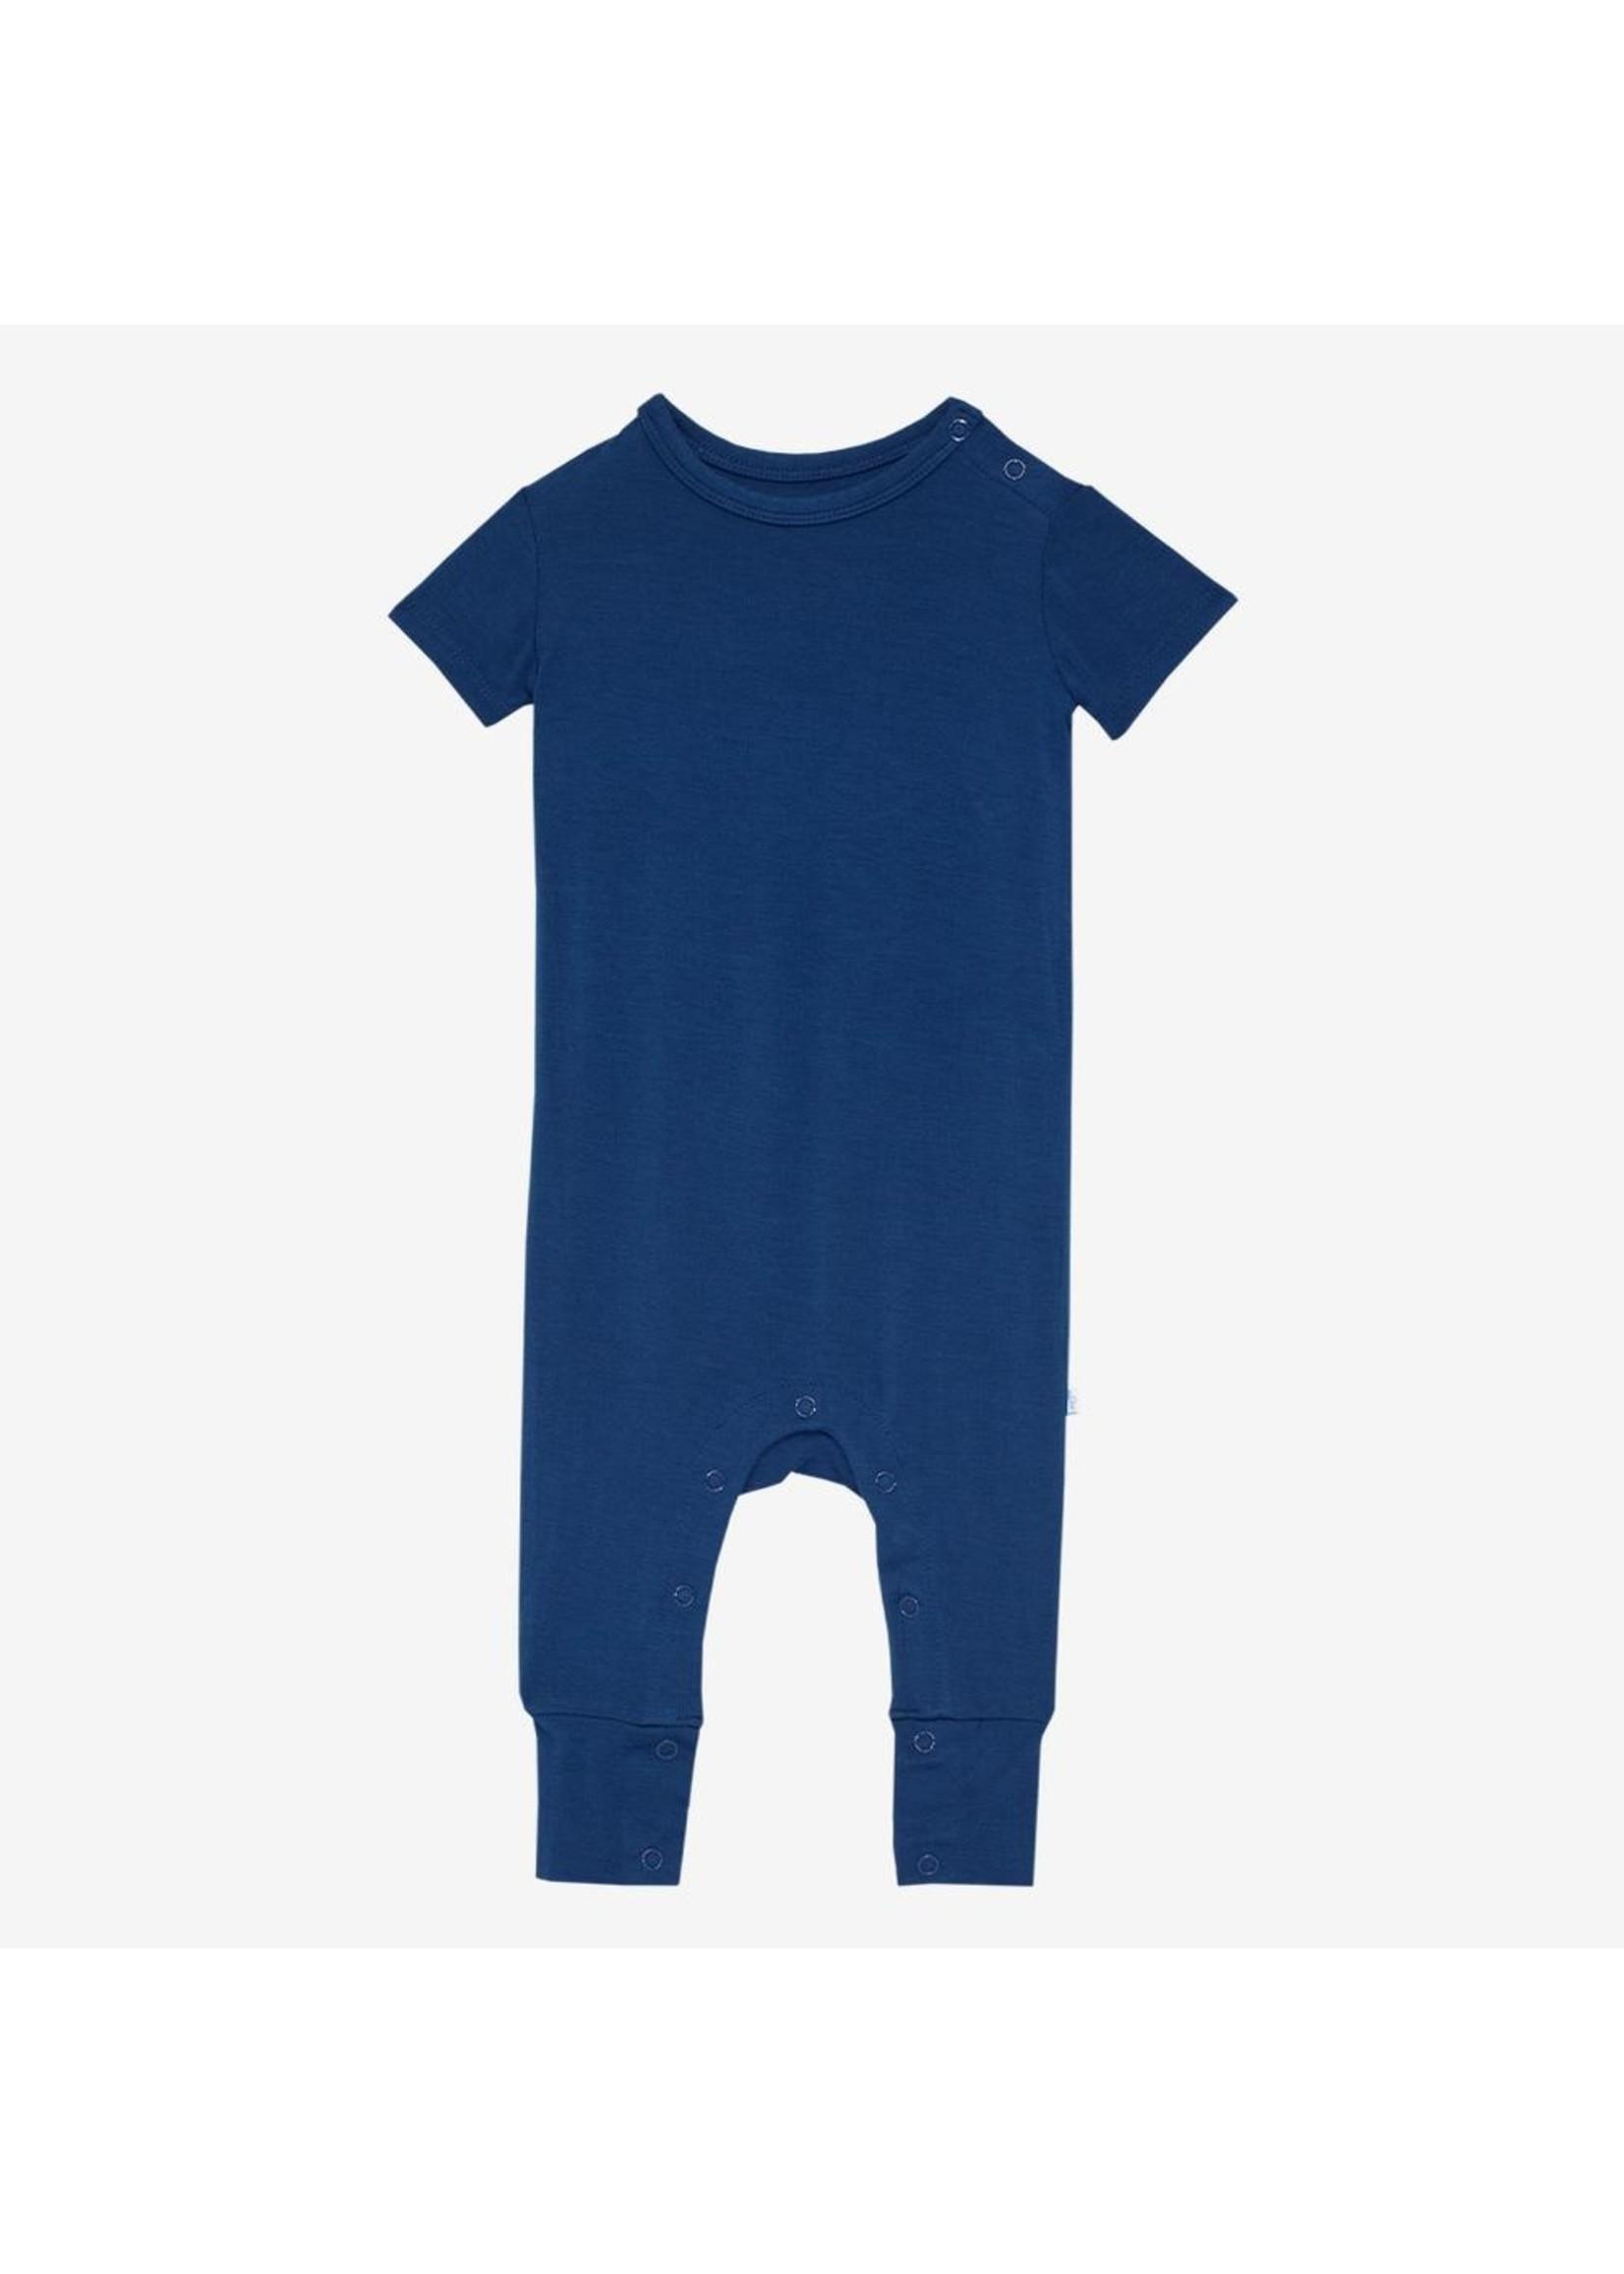 posh peanut Sailor Blue - Short Sleeve Romper